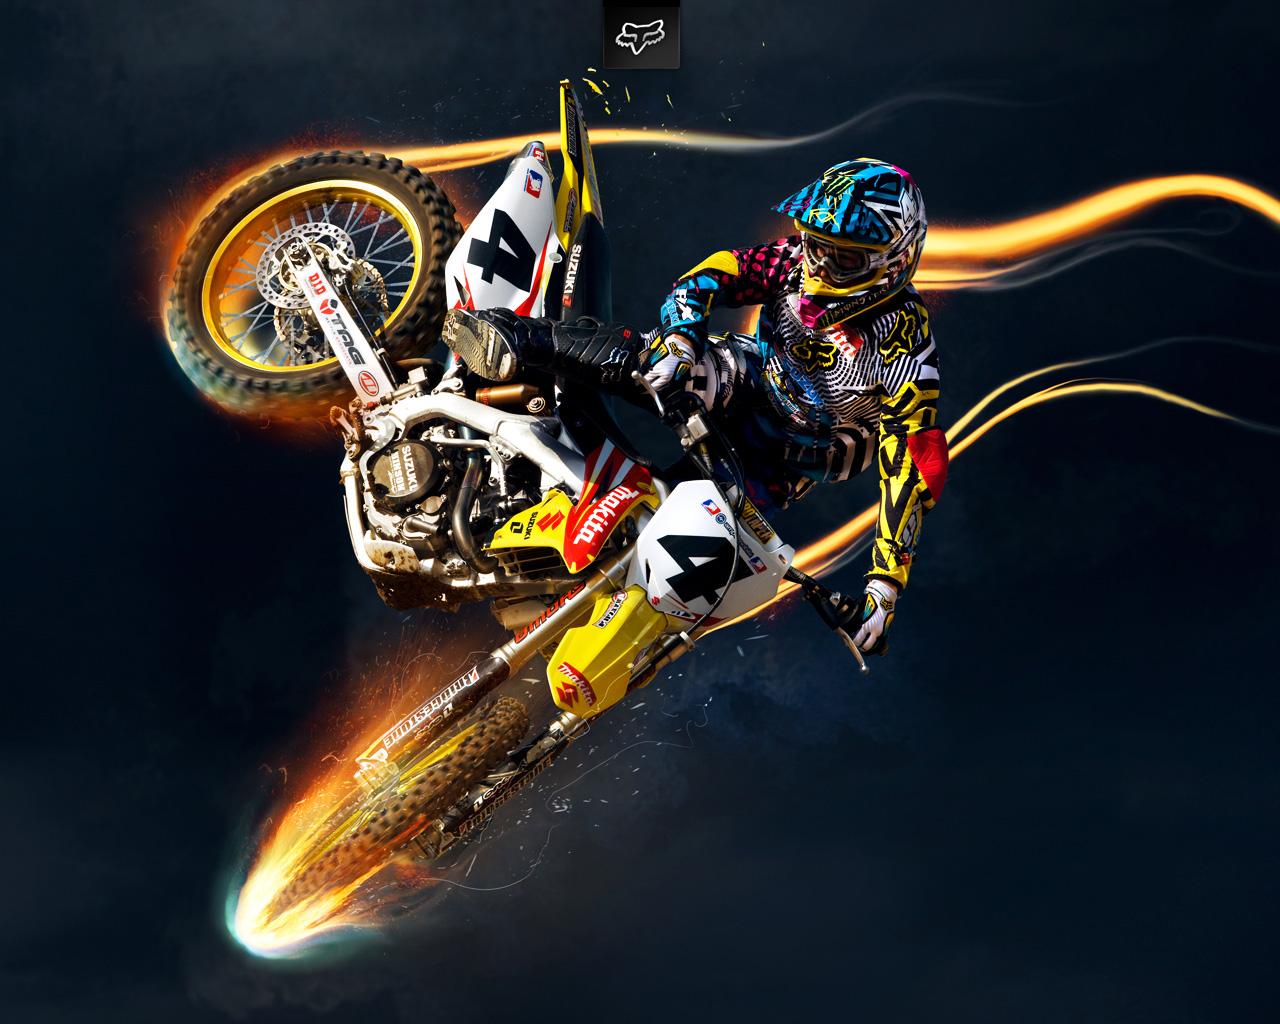 coole motocross wallpaper moto cross offroadforen. Black Bedroom Furniture Sets. Home Design Ideas